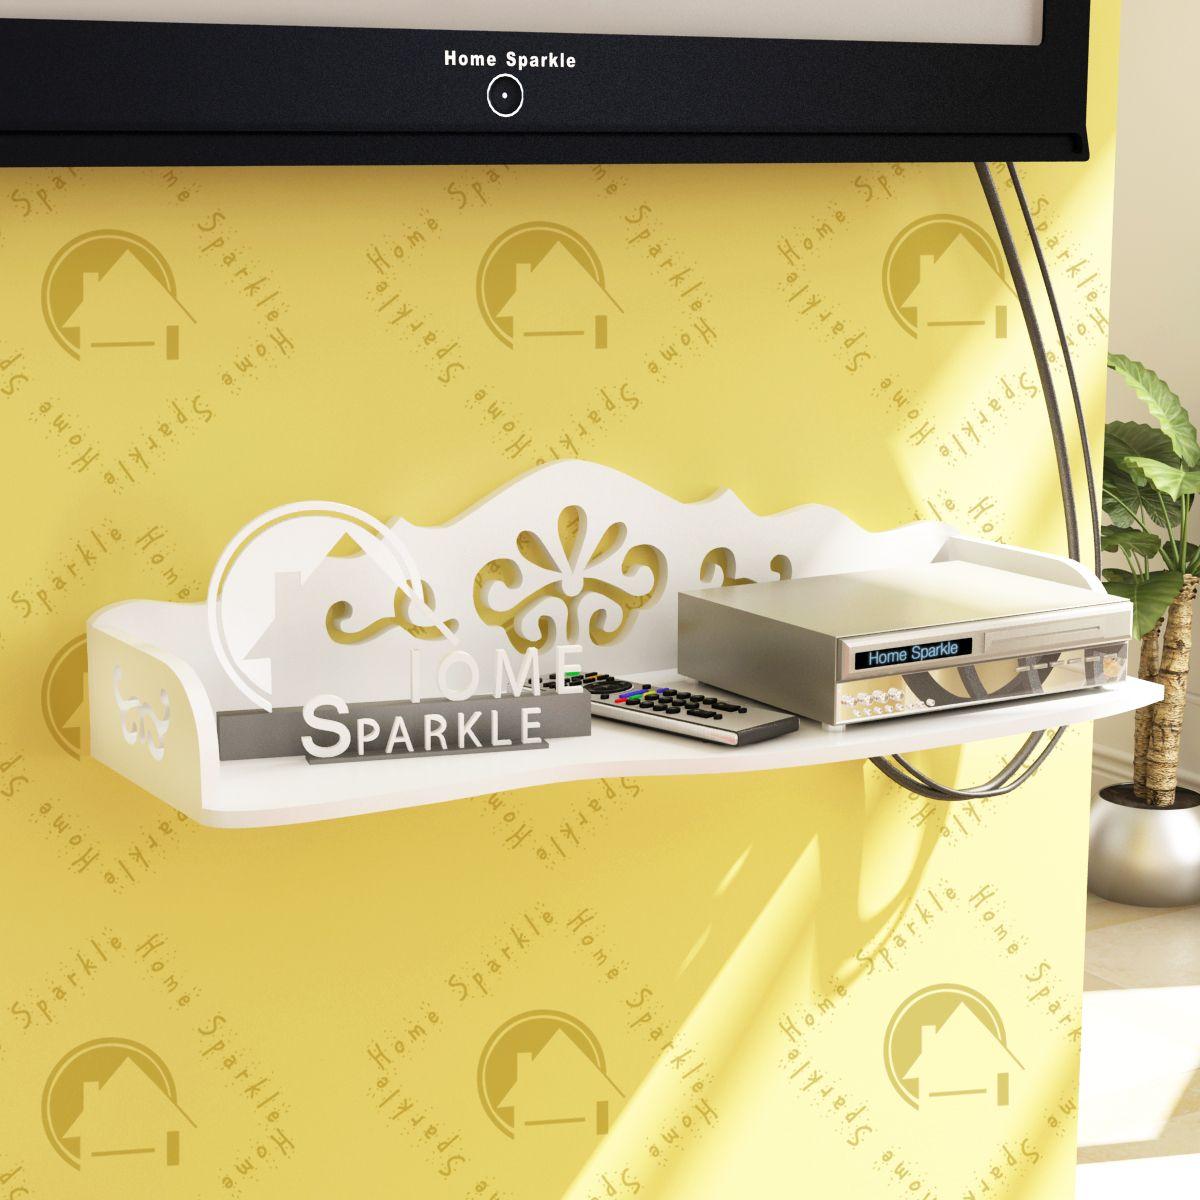 Home Sparkle Carved Set Top Box Holder/Wifi Modem Stand, Suitable For Living Room/ Bedroom ( Designed By Craftsman)